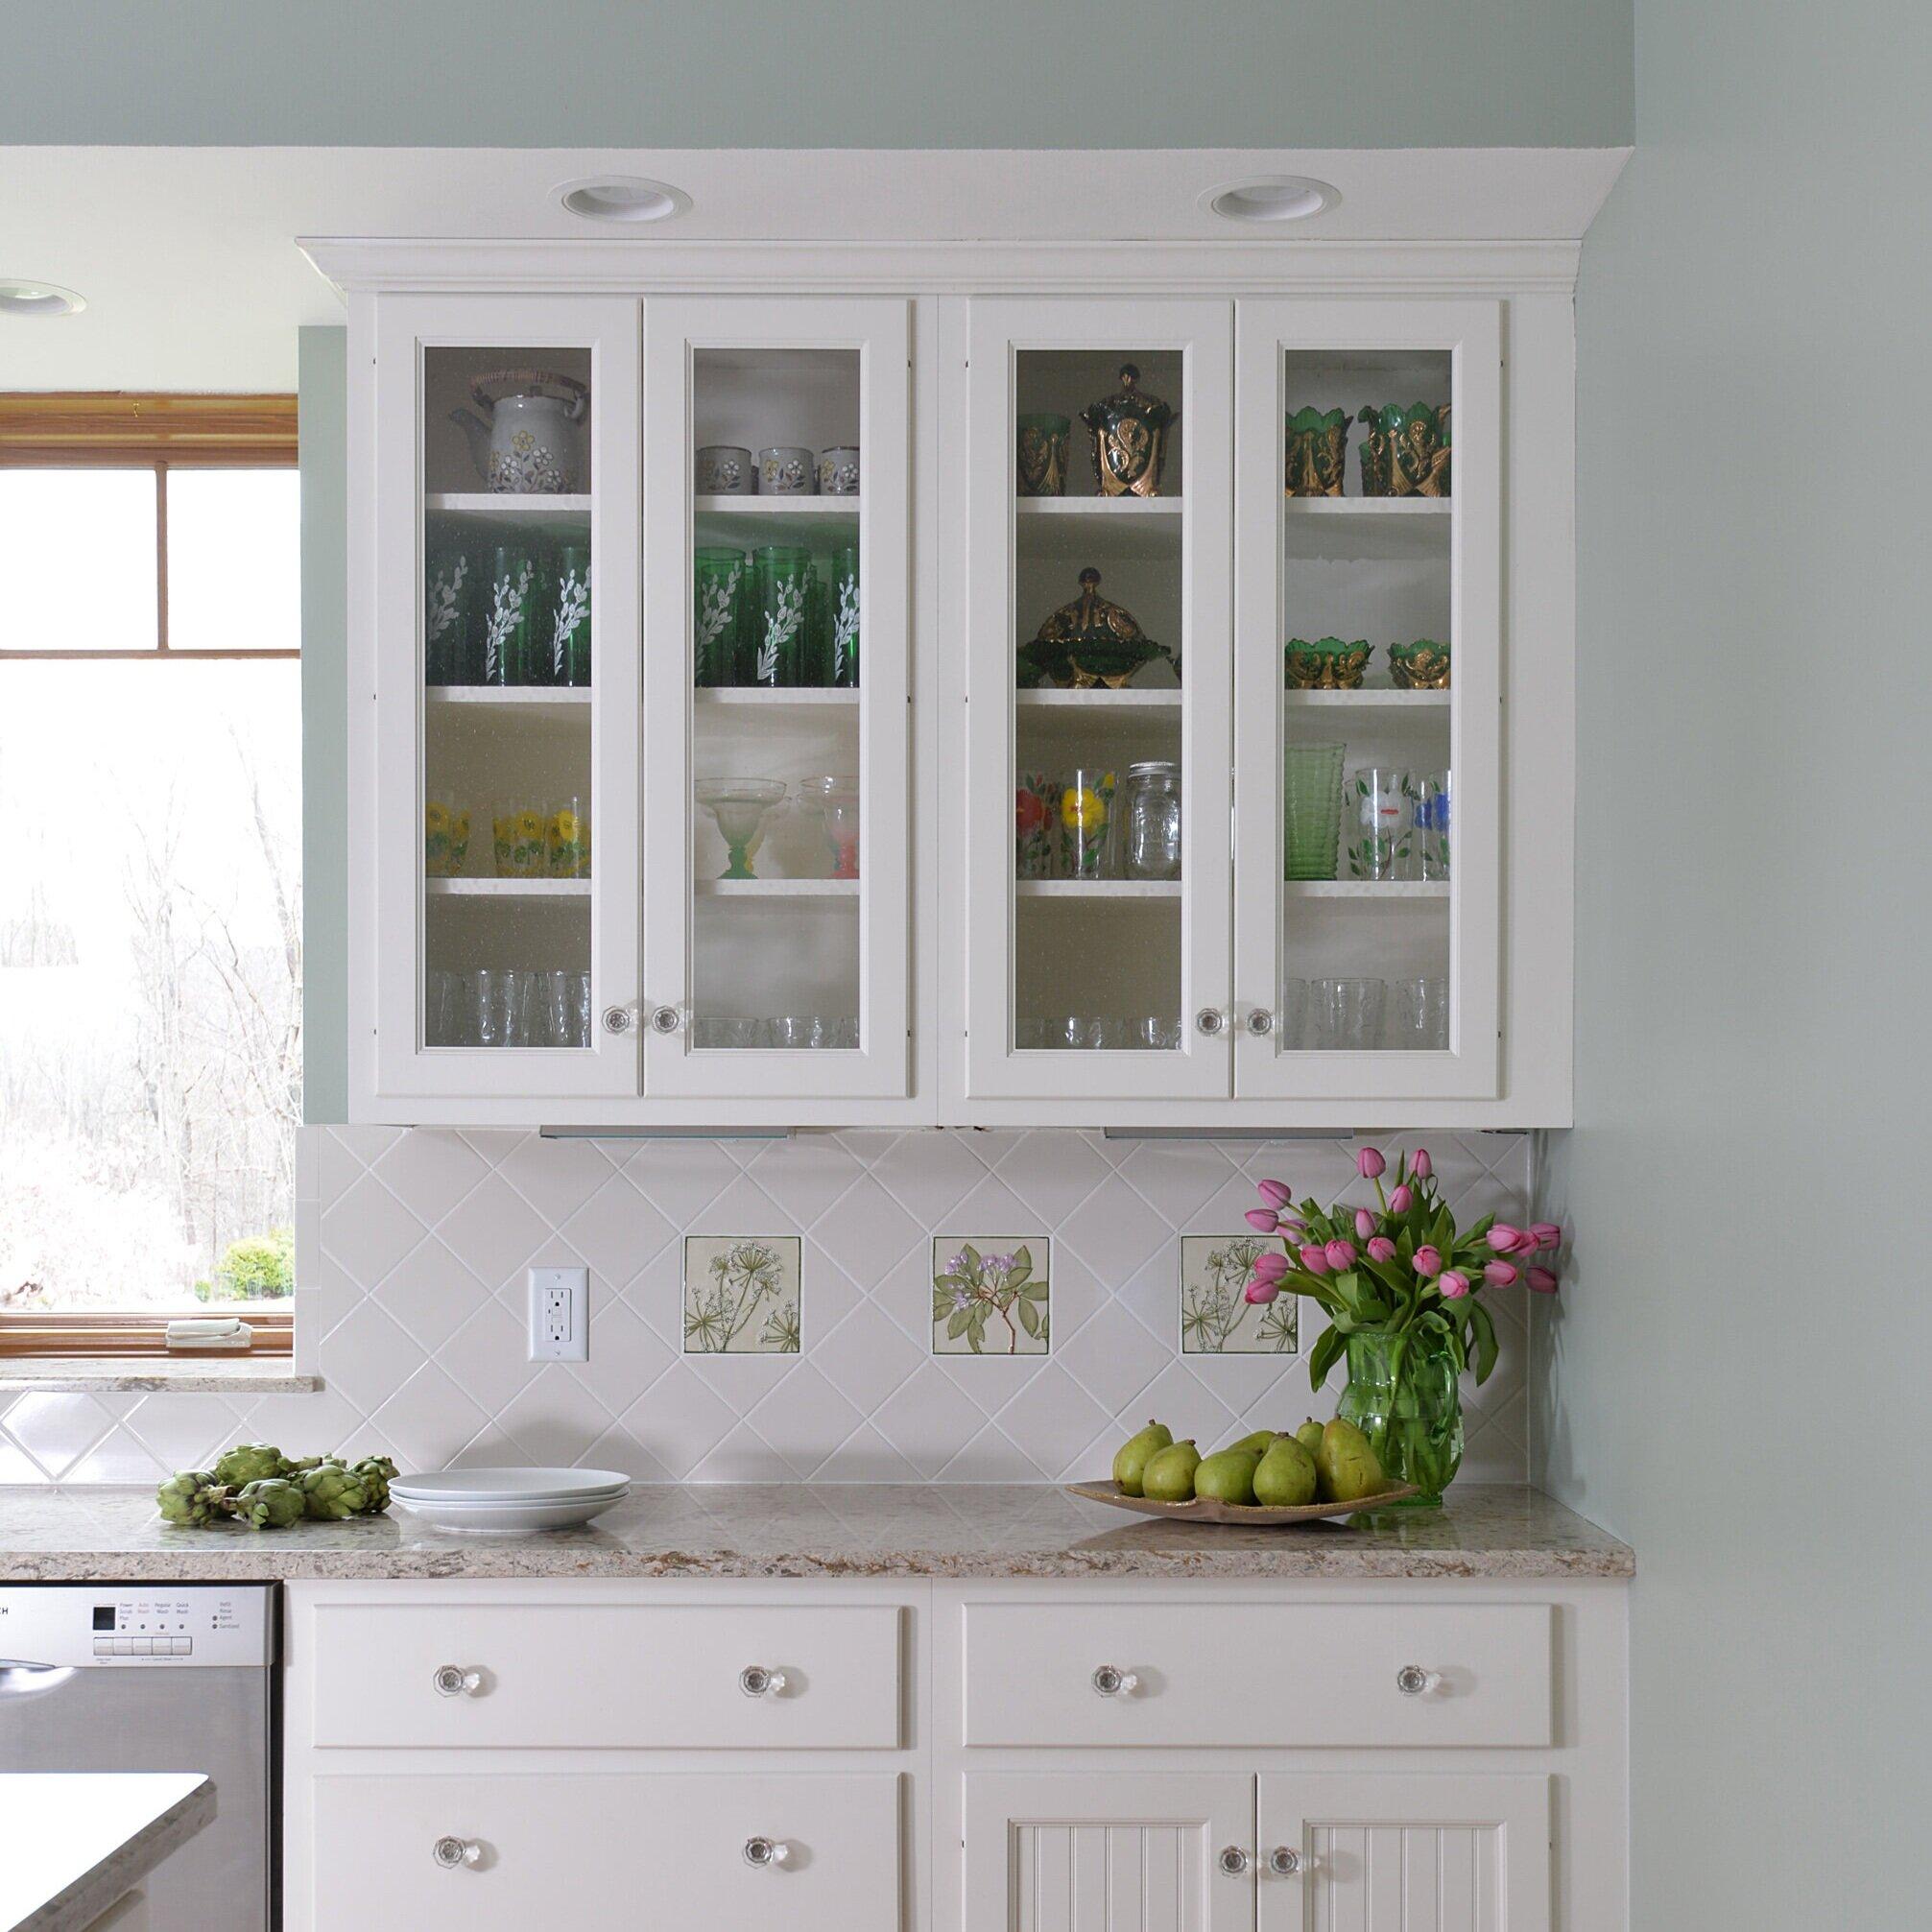 North Silver Lane - Kitchen Remodel